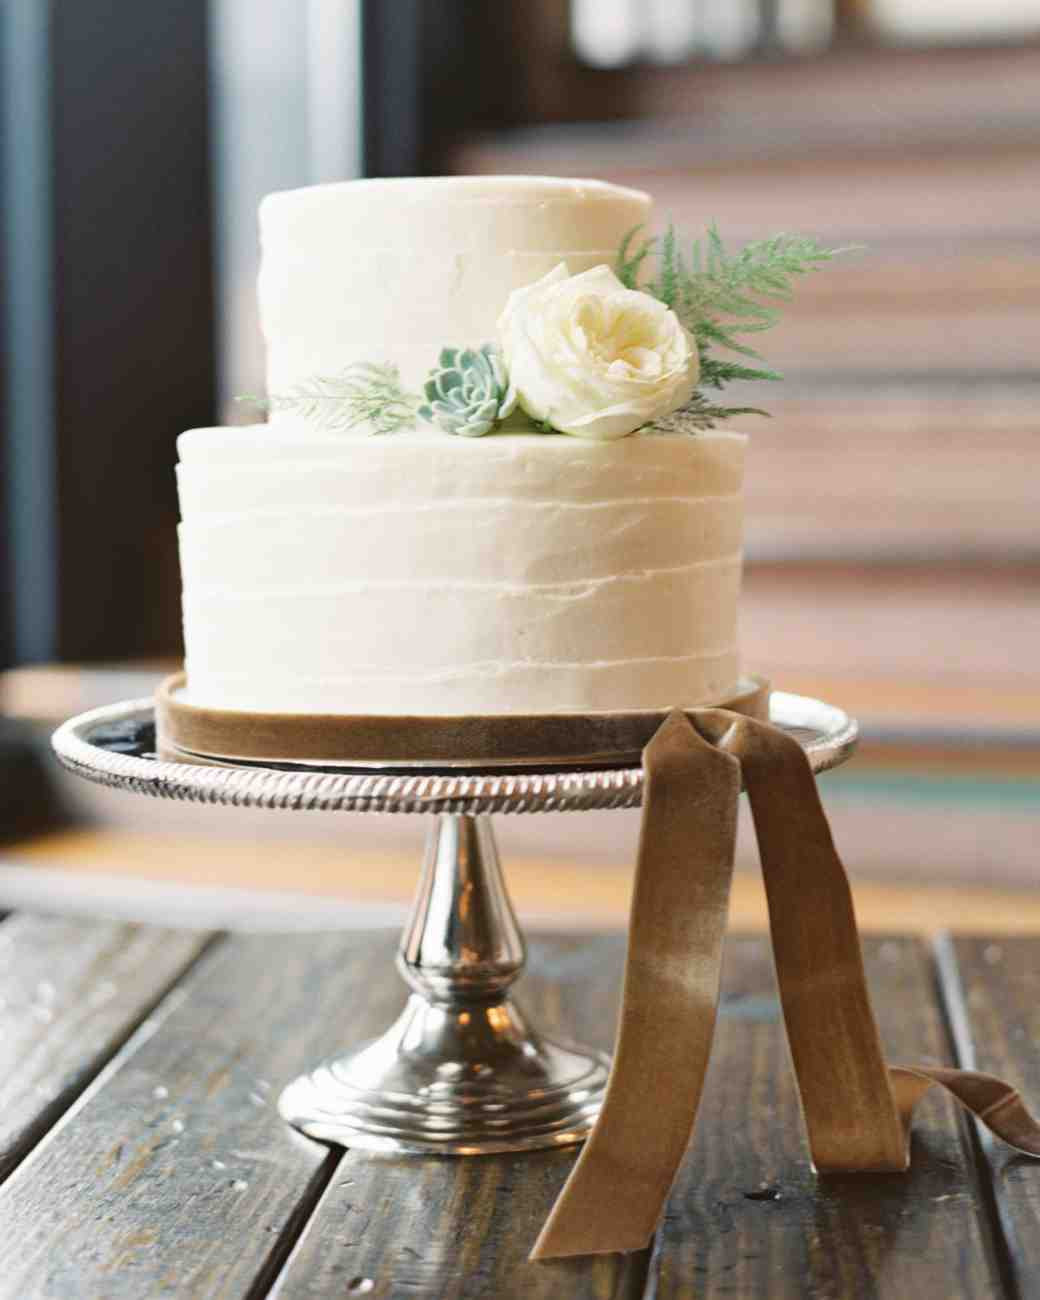 Tiny Wedding Cakes  Small Wedding Cakes ⋆ Cakes for birthday & wedding